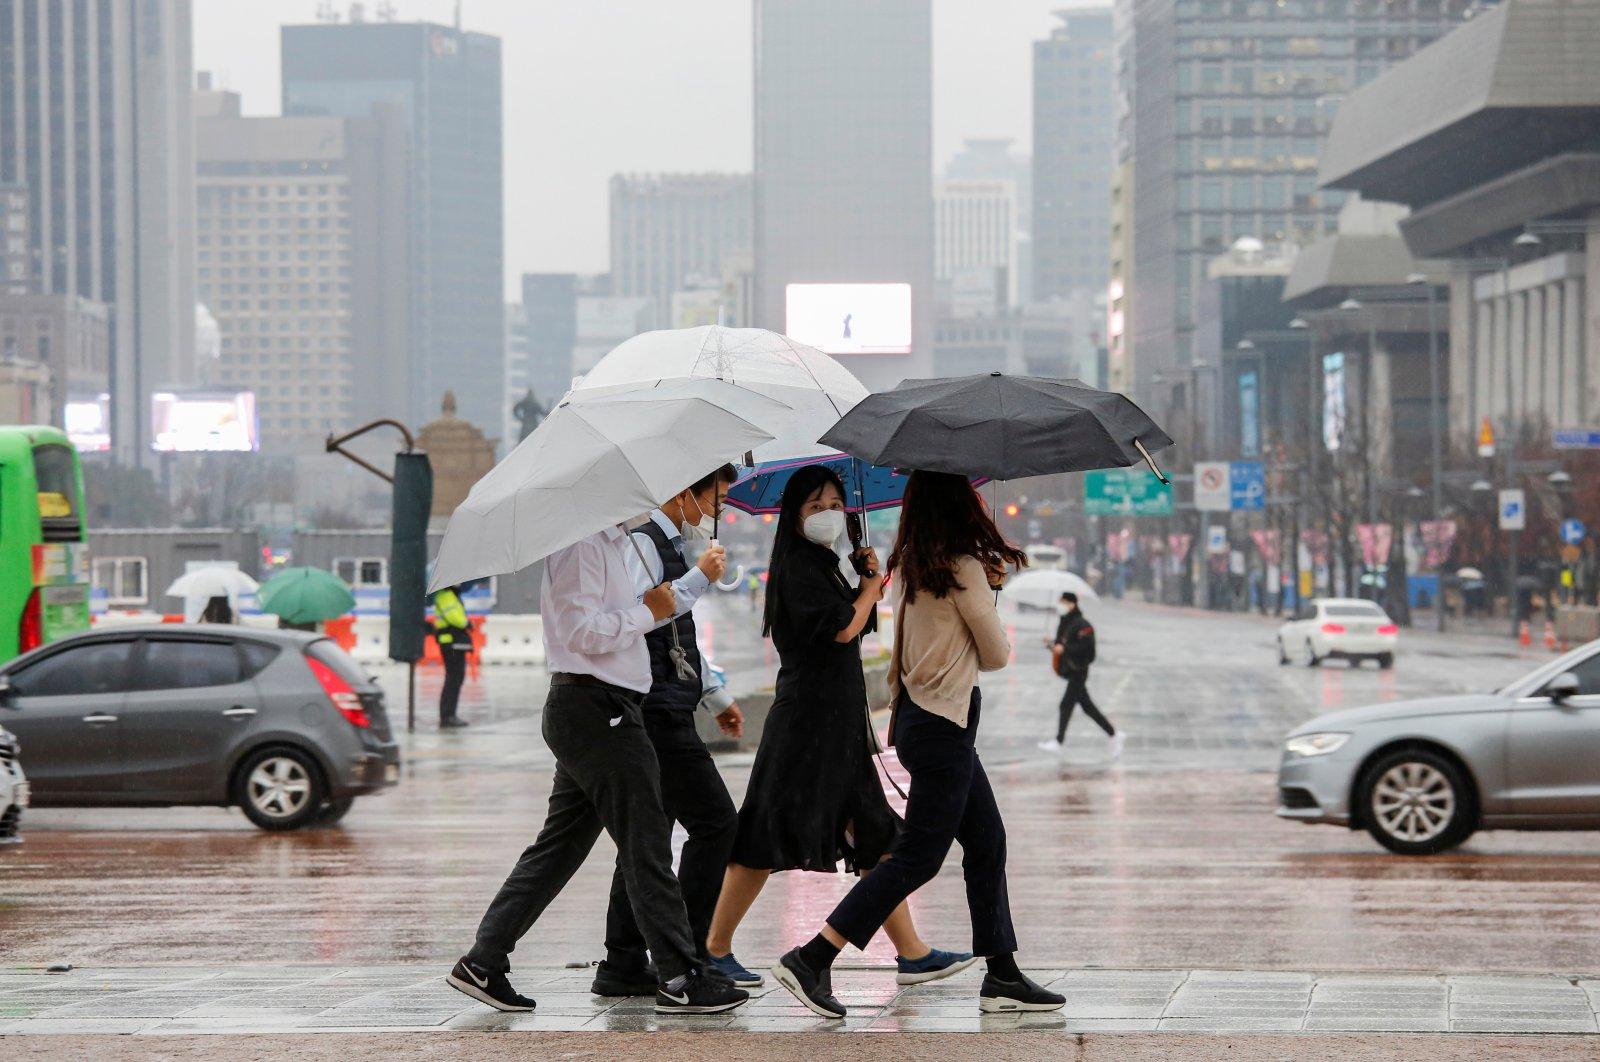 Pedestrians wearing masks walk with umbrellas as it rains amid the coronavirus disease (COVID-19) pandemic in central Seoul, South Korea, November 19, 2020. (Reuters Photo)